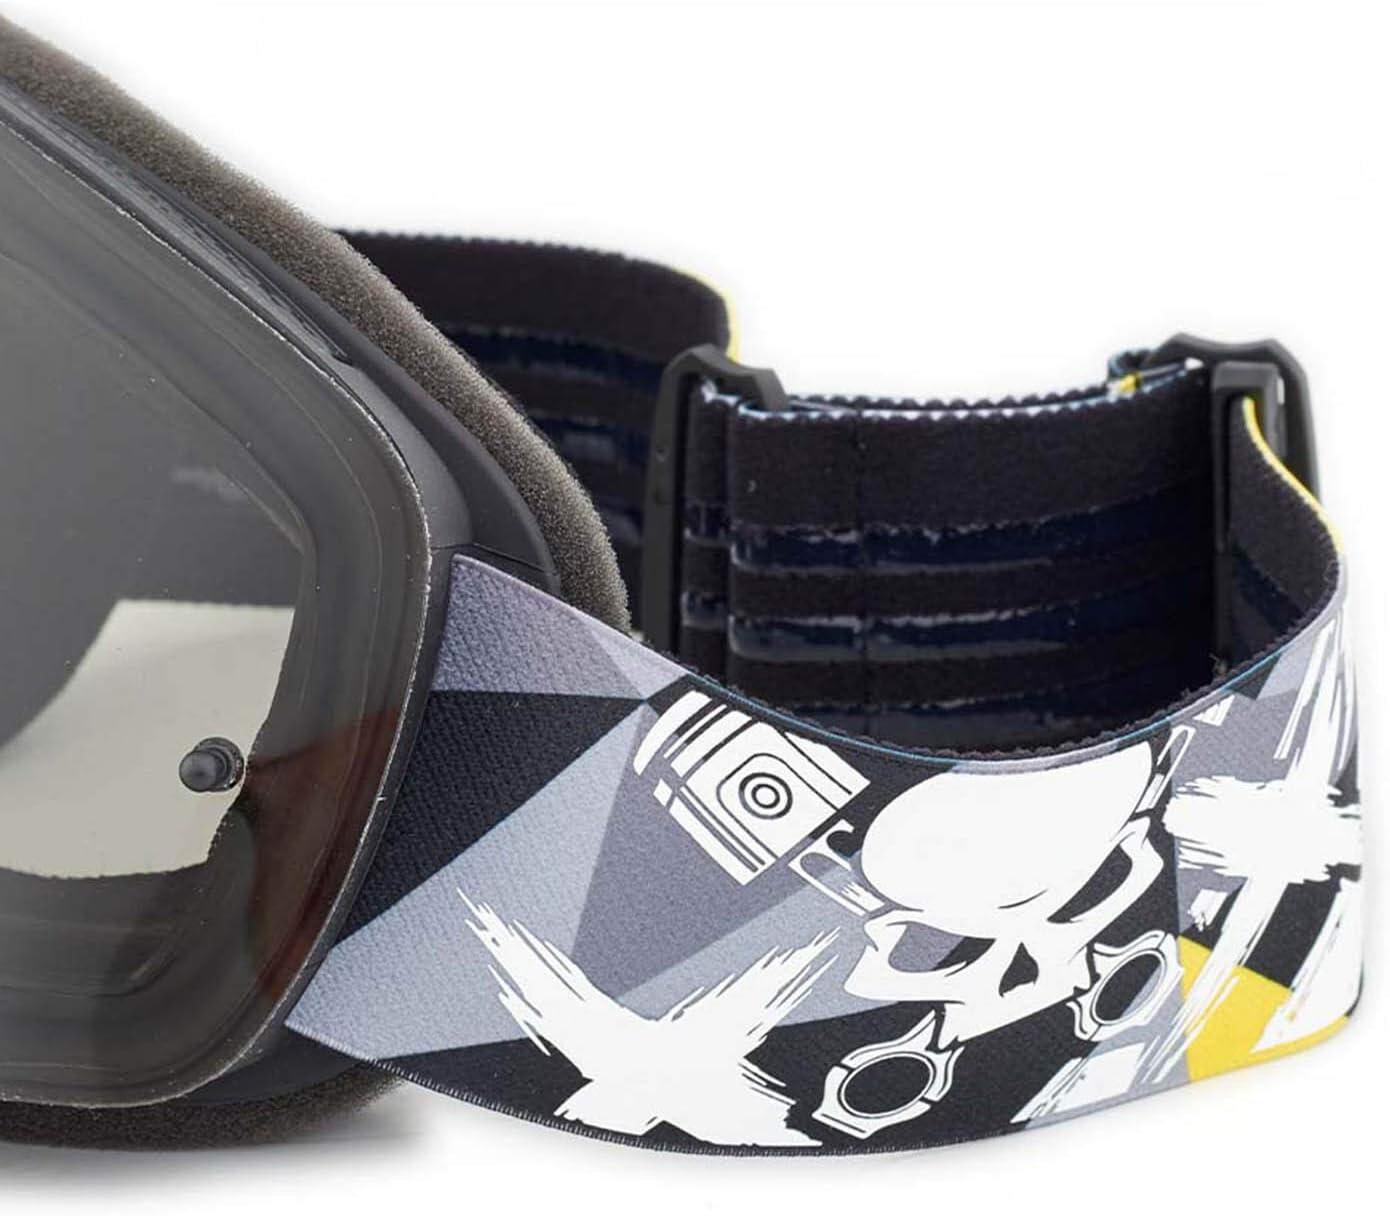 GRENZGAENGER NFX Goggles MX Warpaint camo blue